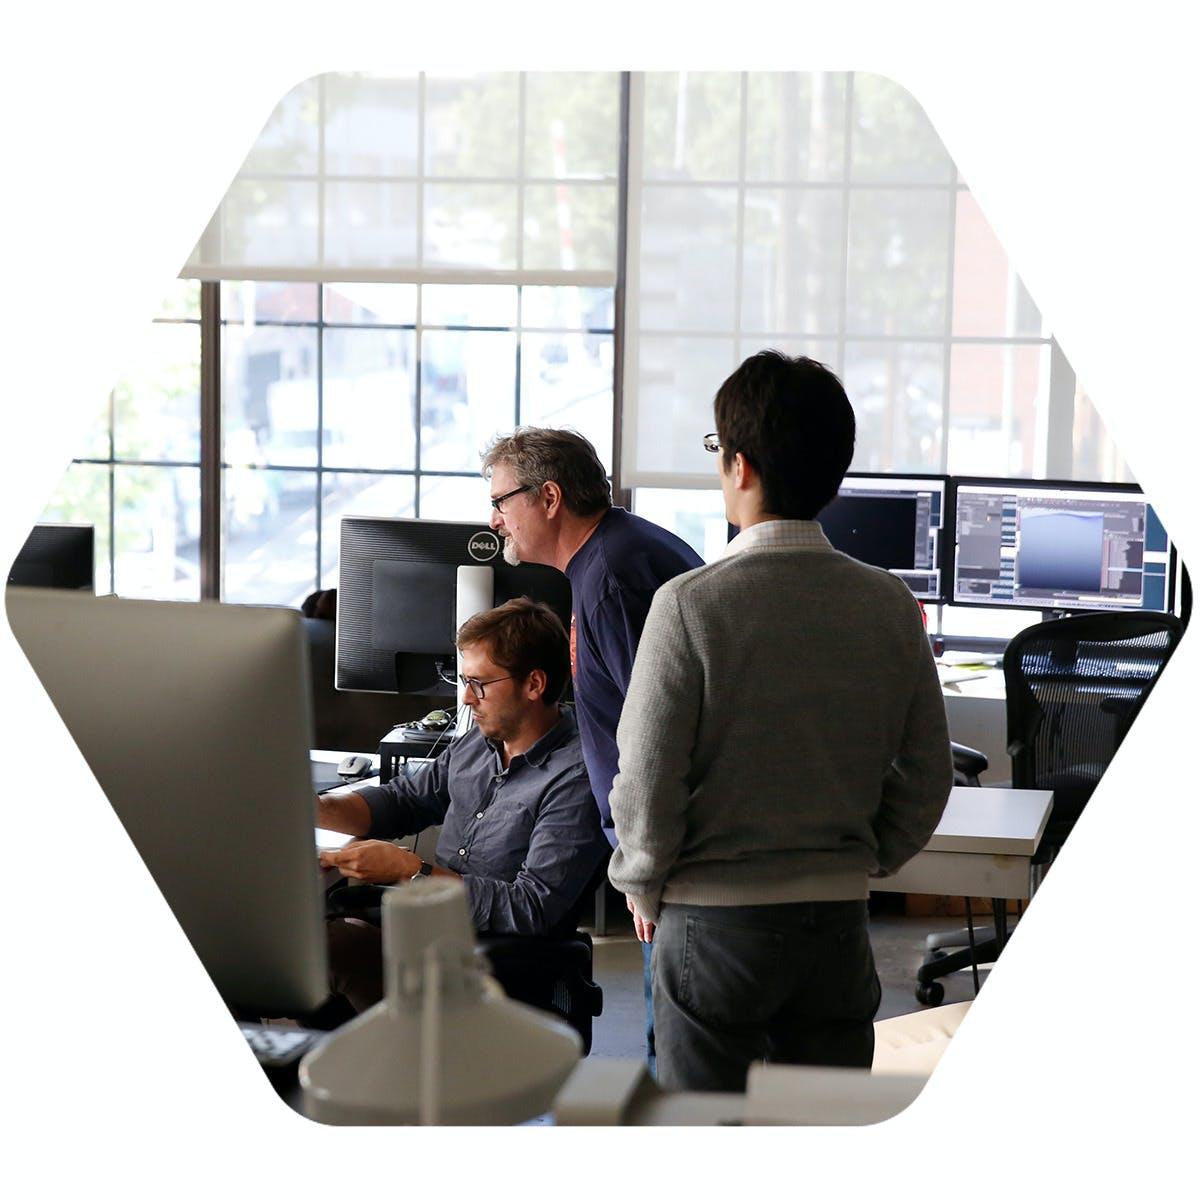 Develop and Deploy Windows Applications on Google Cloud Platform